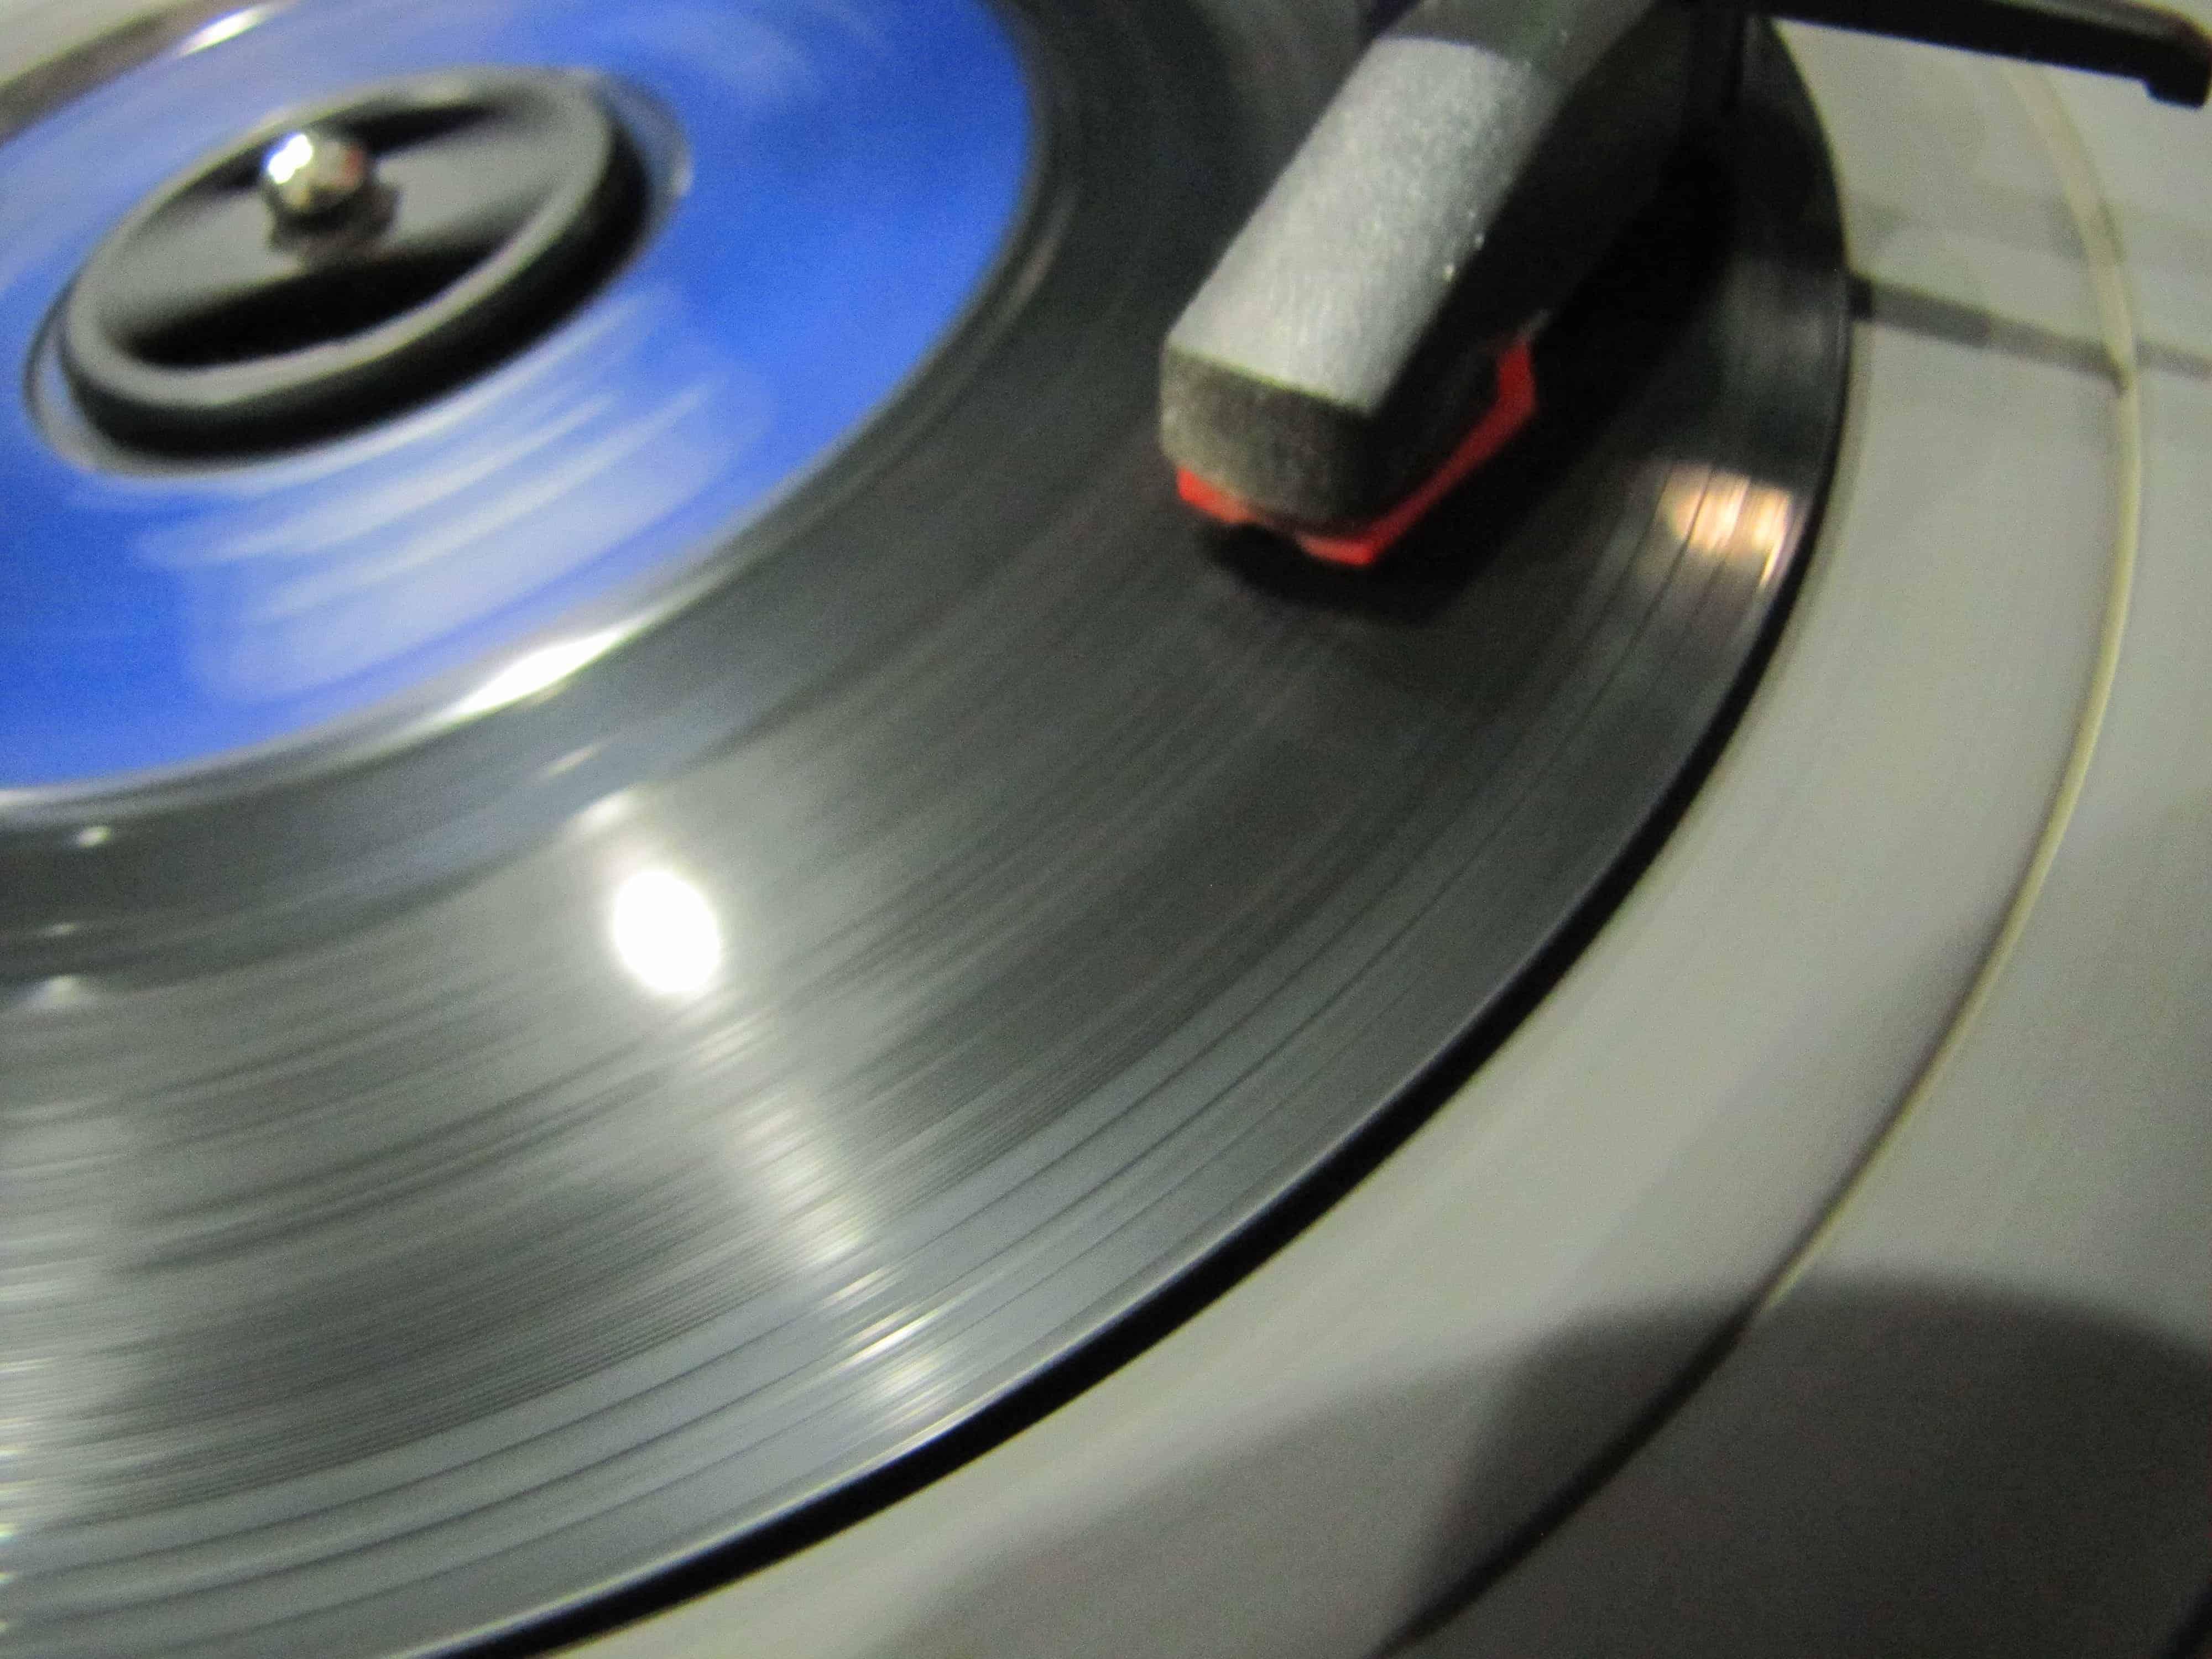 Clean 45 rpm Record